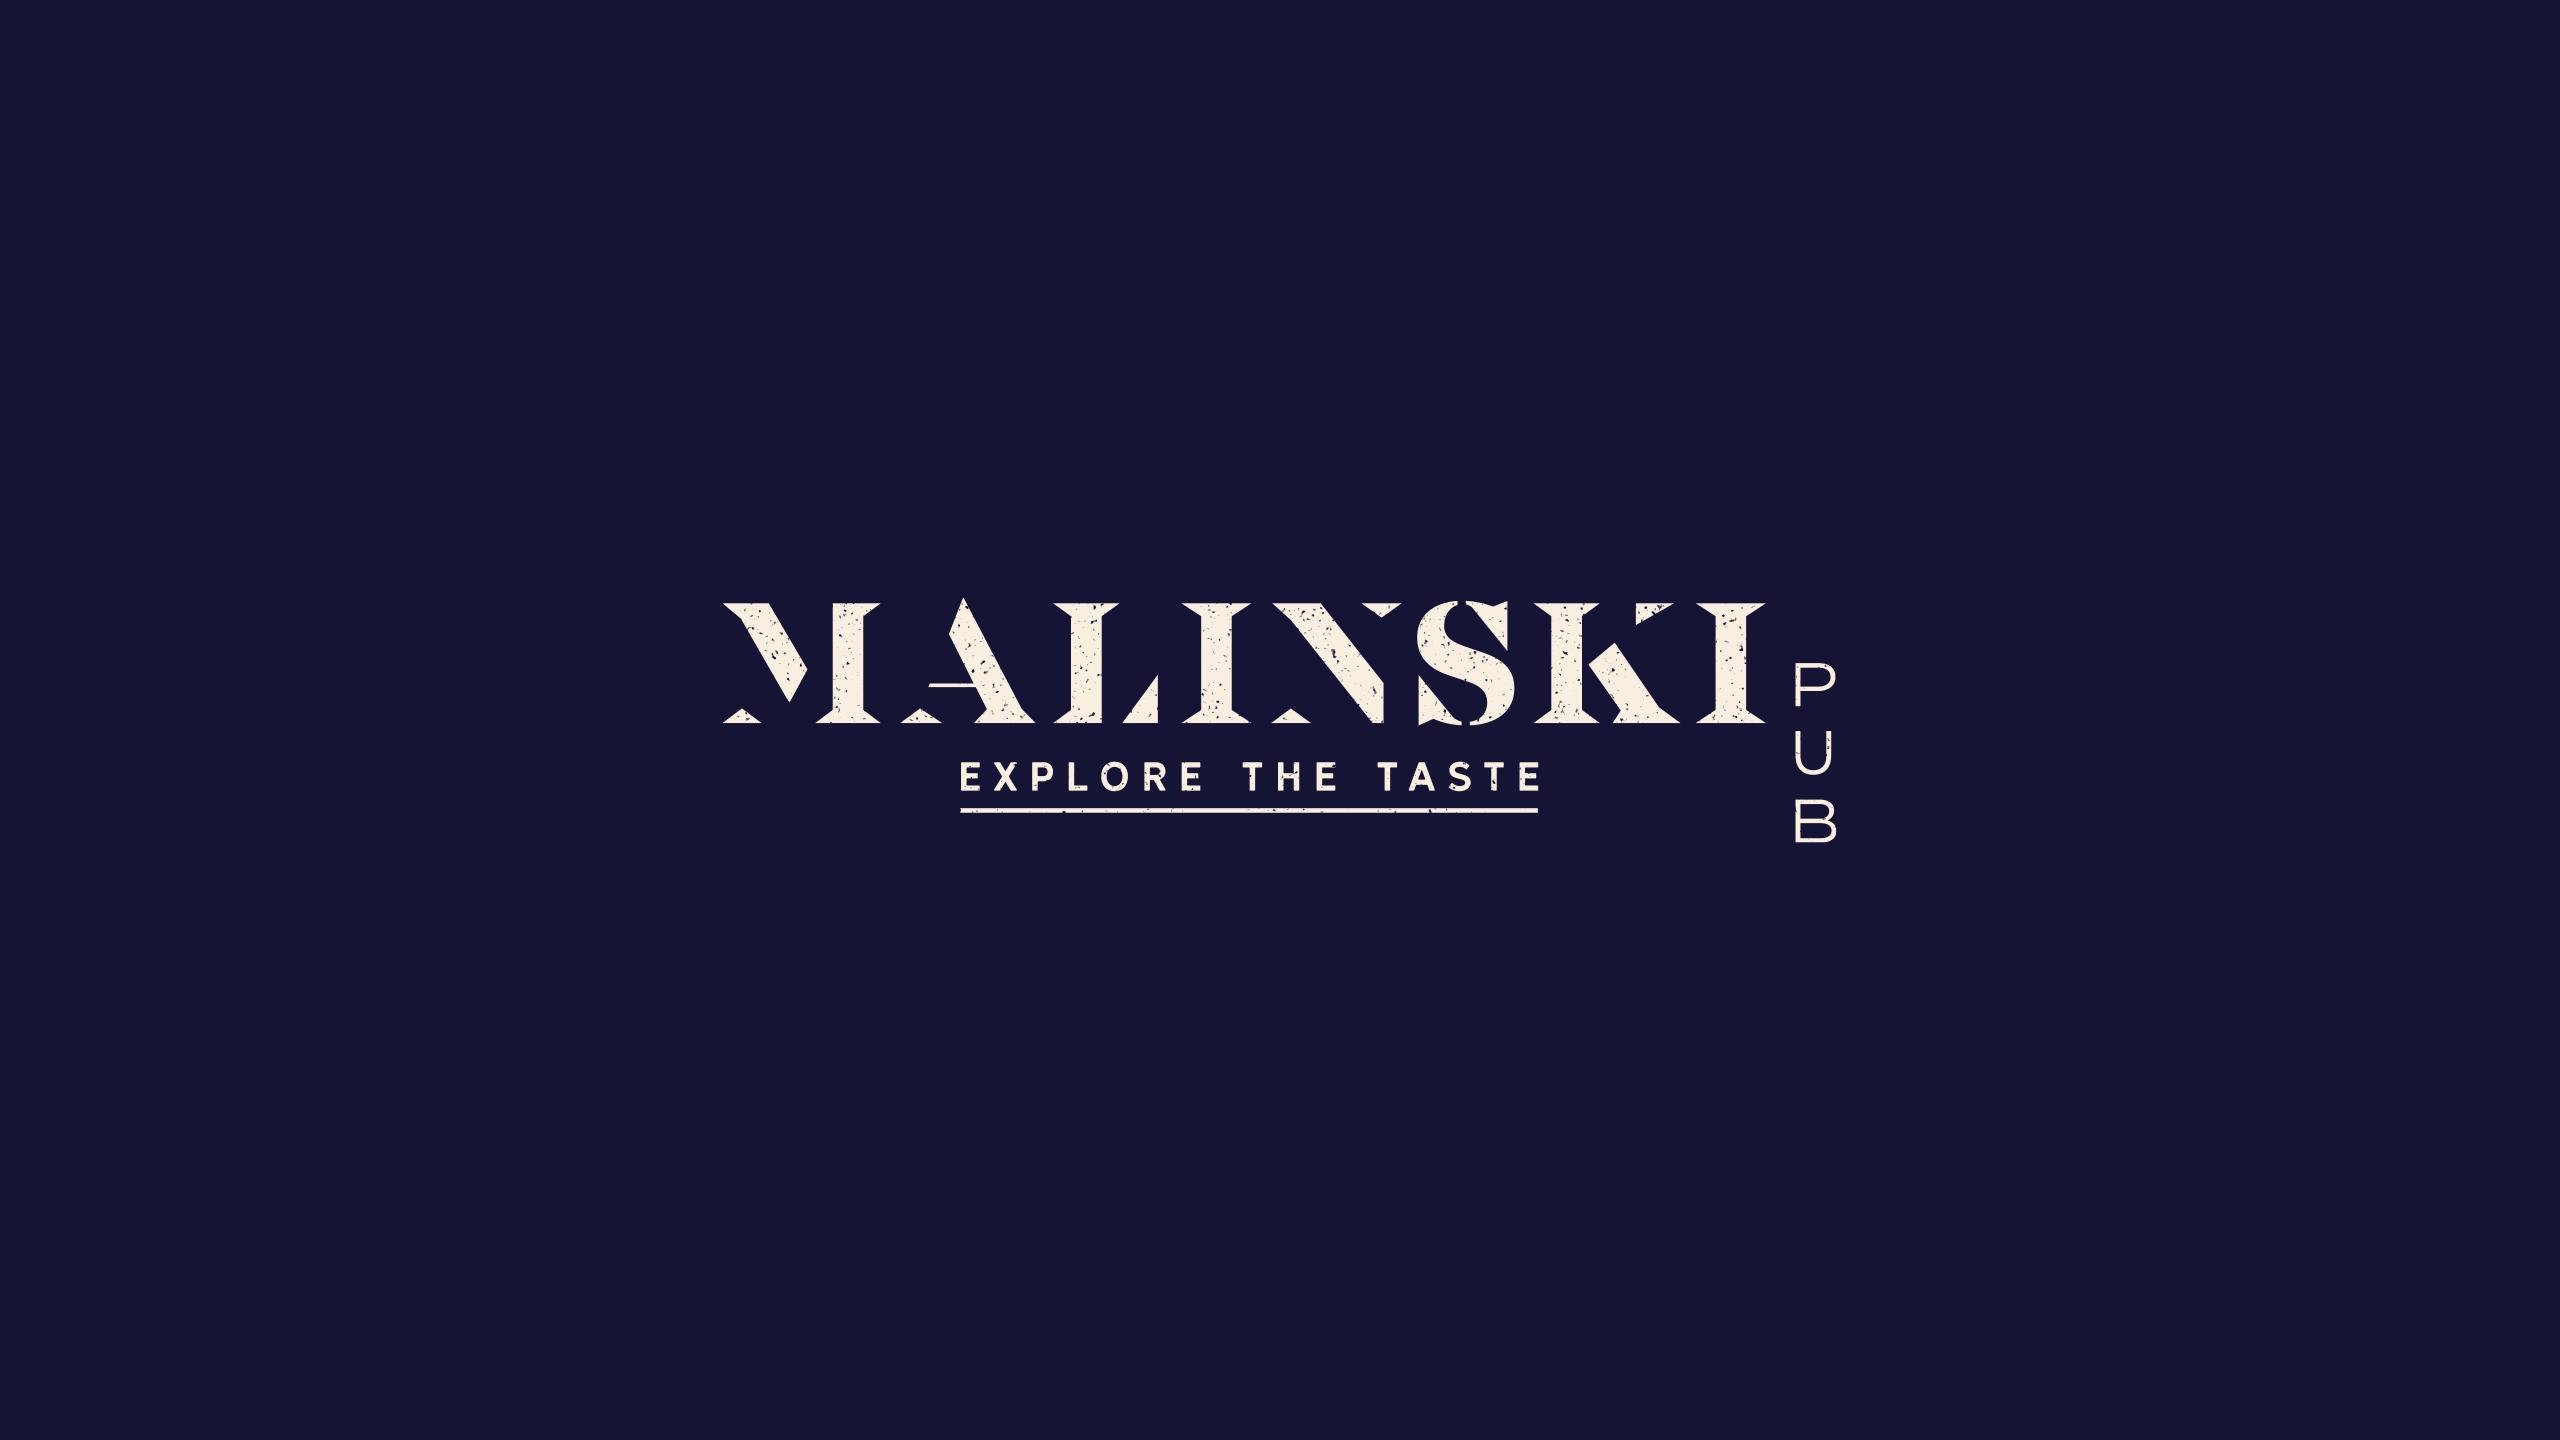 firmorama_malinski-pub_02